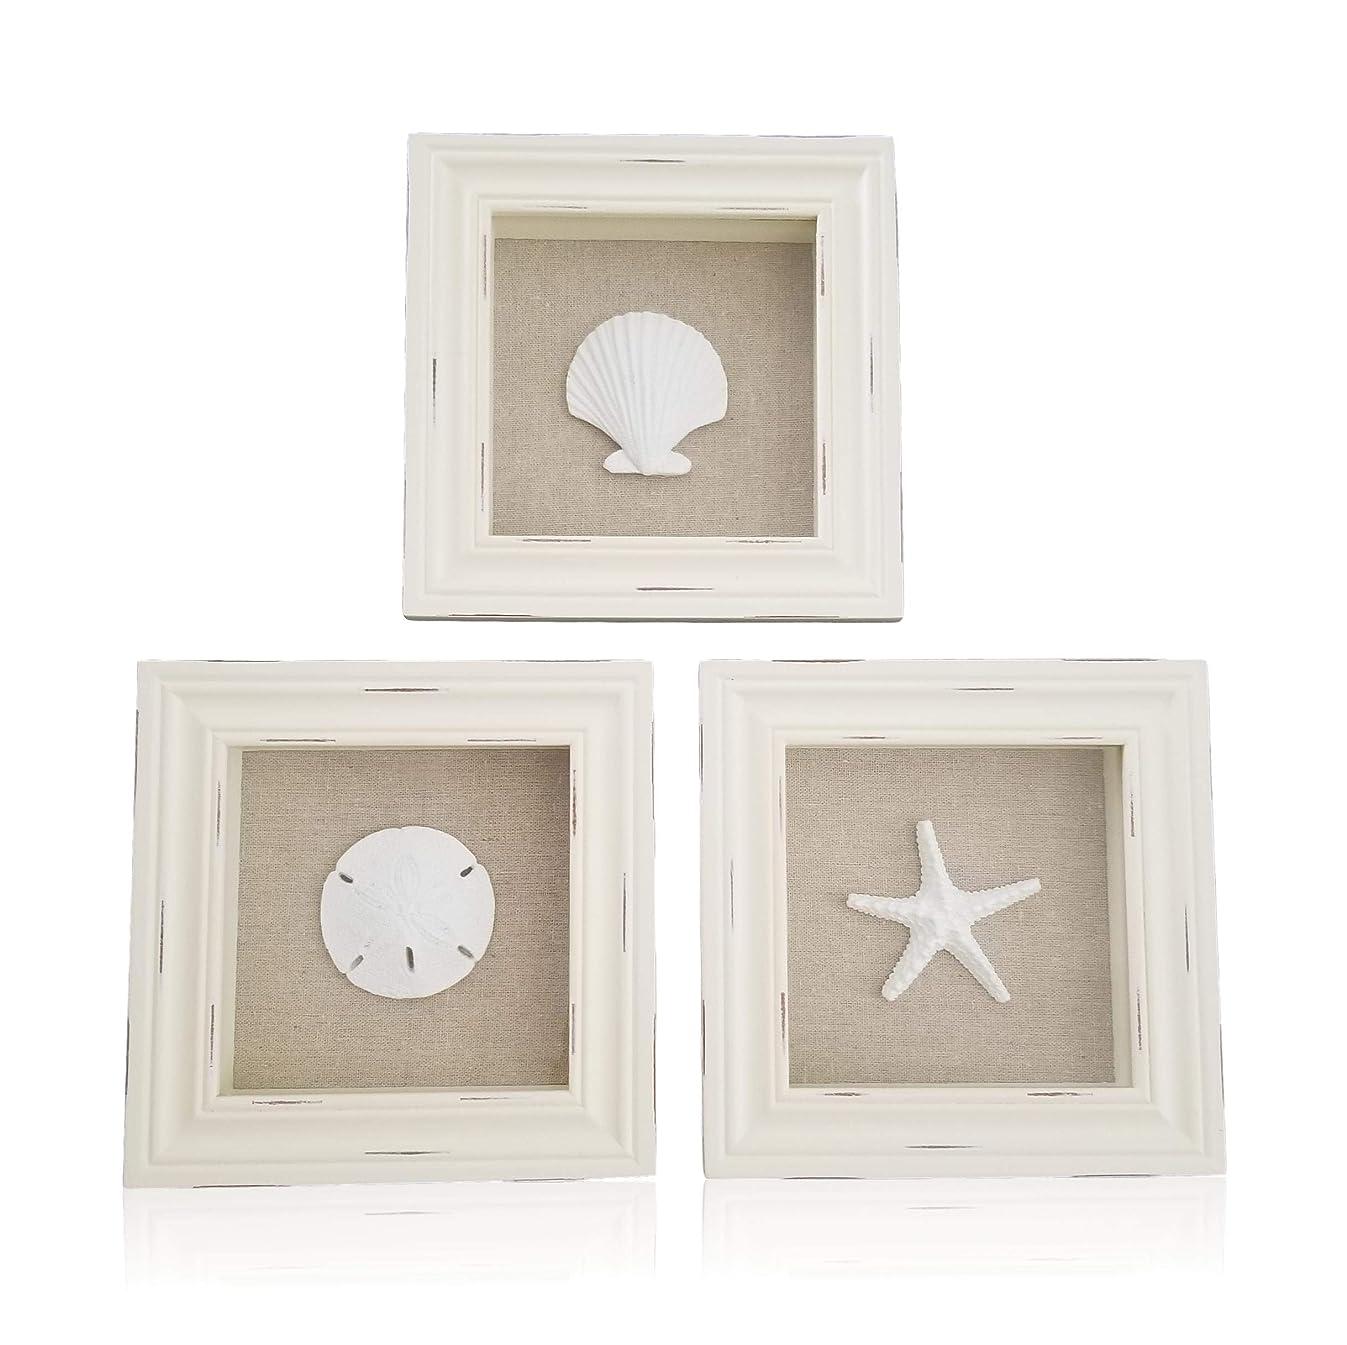 Tumbler Home Custom Set of 3 Shell Shabby Chic Shadow Boxes- Off White Frame 7